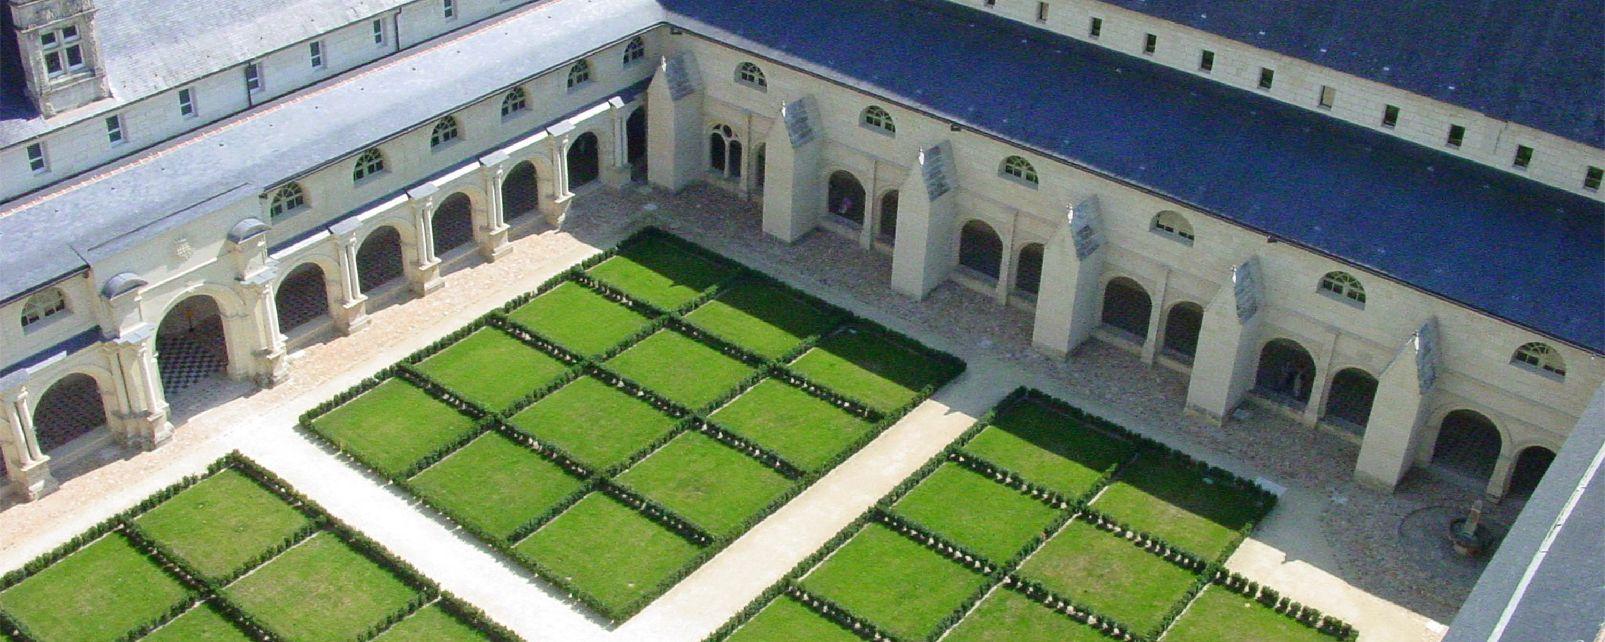 H tel abbaye royale de fontevraud fontevraud l 39 abbaye - Hotel abbaye de fontevraud ...